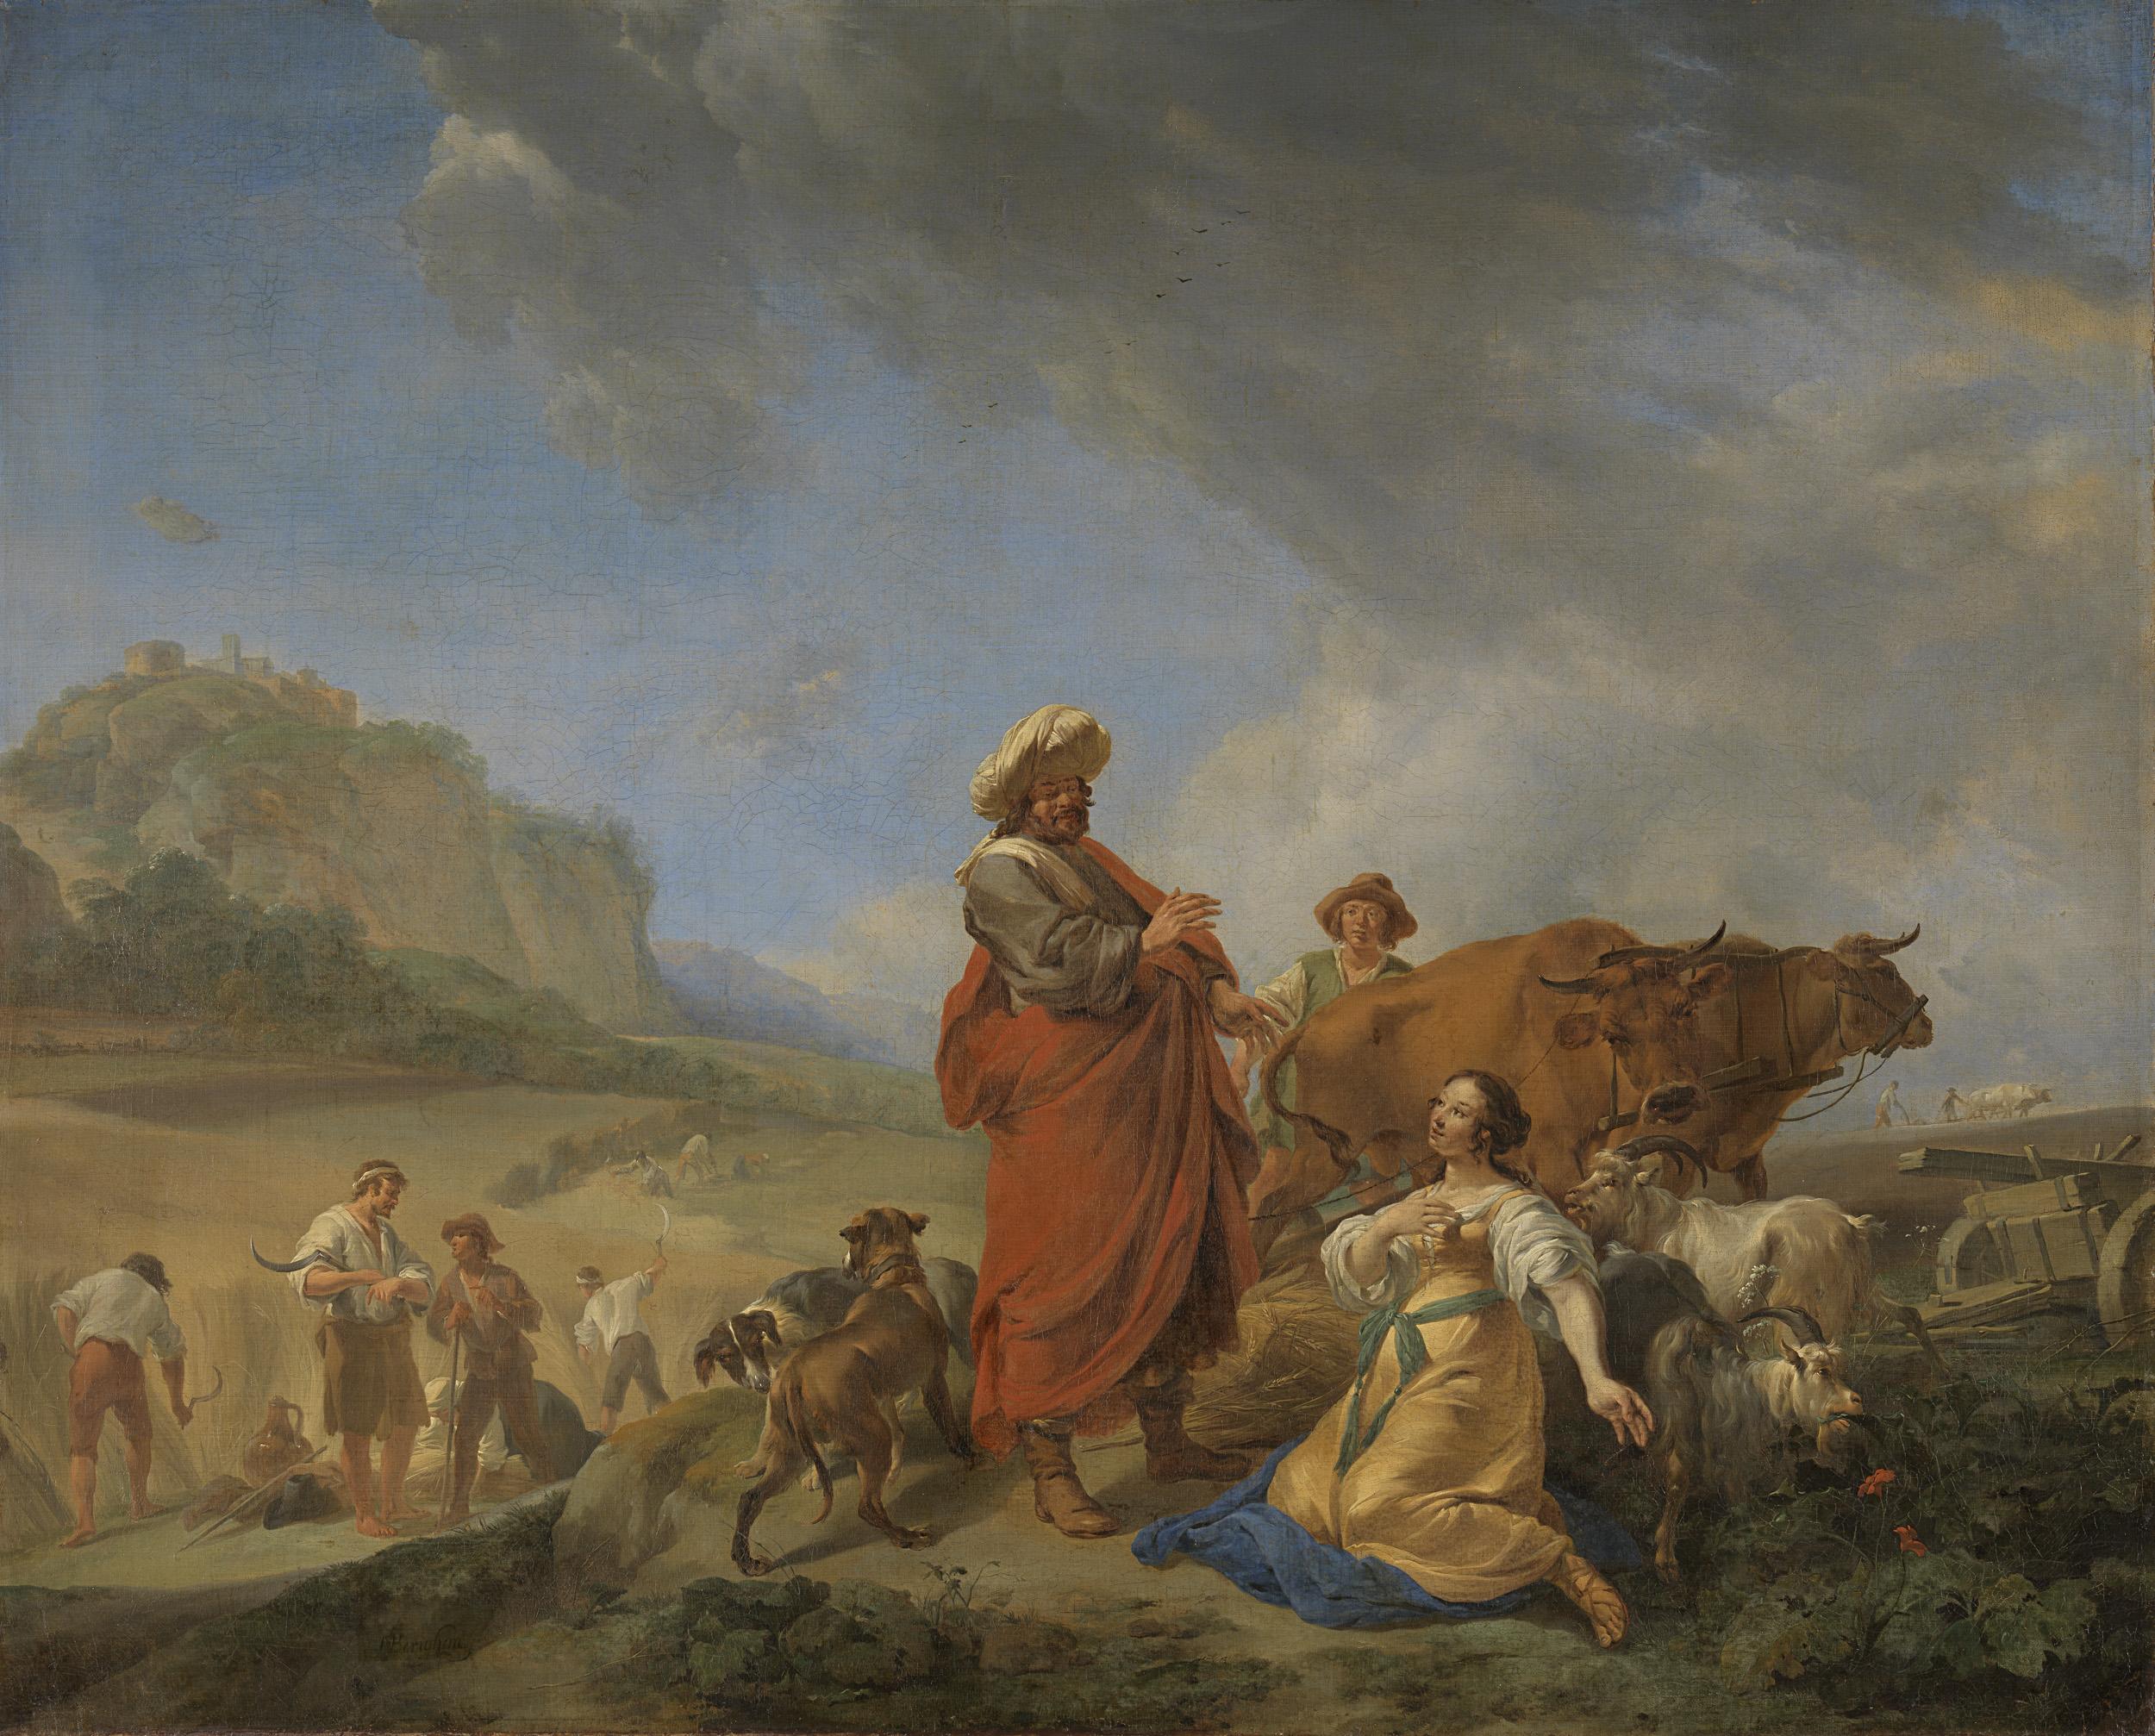 Рут и Боаз. Николас Питерс Берхем, 1640-1650